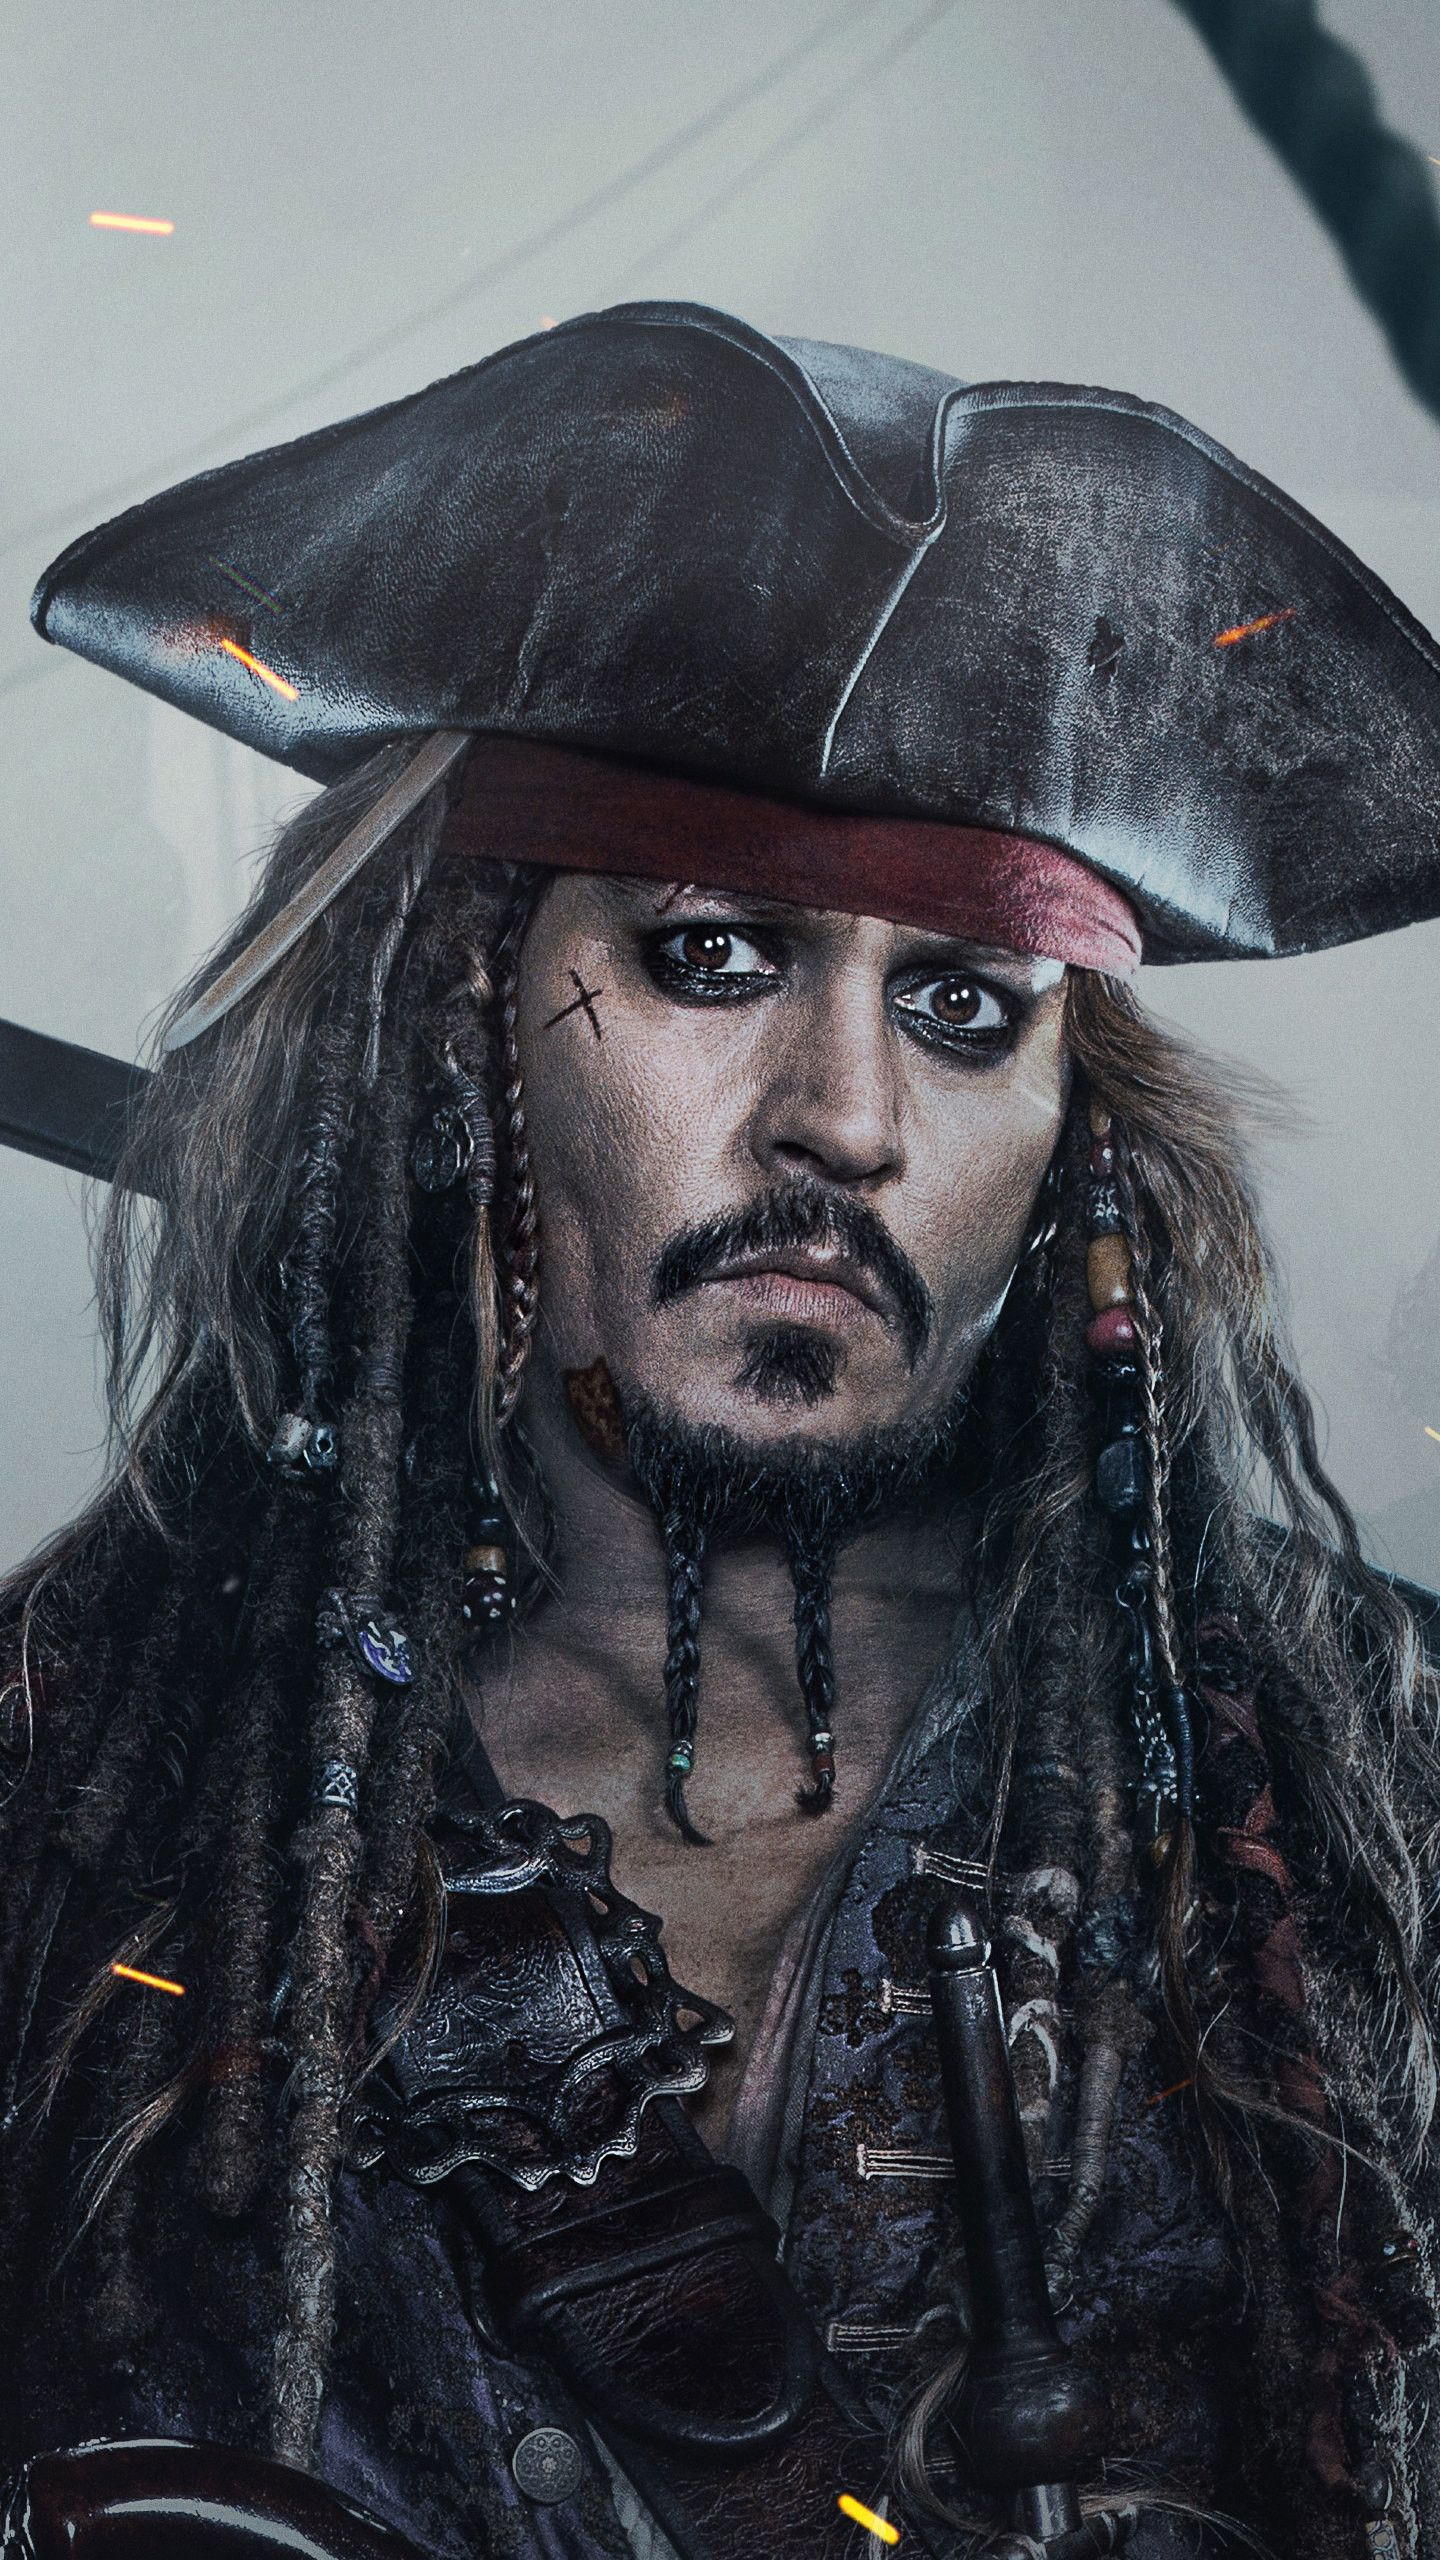 Qhd Samsung Galaxy S6 S7 Edge Note Lg G4 1440x2560 1440x2560 Jack Sparrow Wallpaper Jack Sparrow Captain Jack Sparrow Ultra hd hd 1080p jack sparrow wallpaper